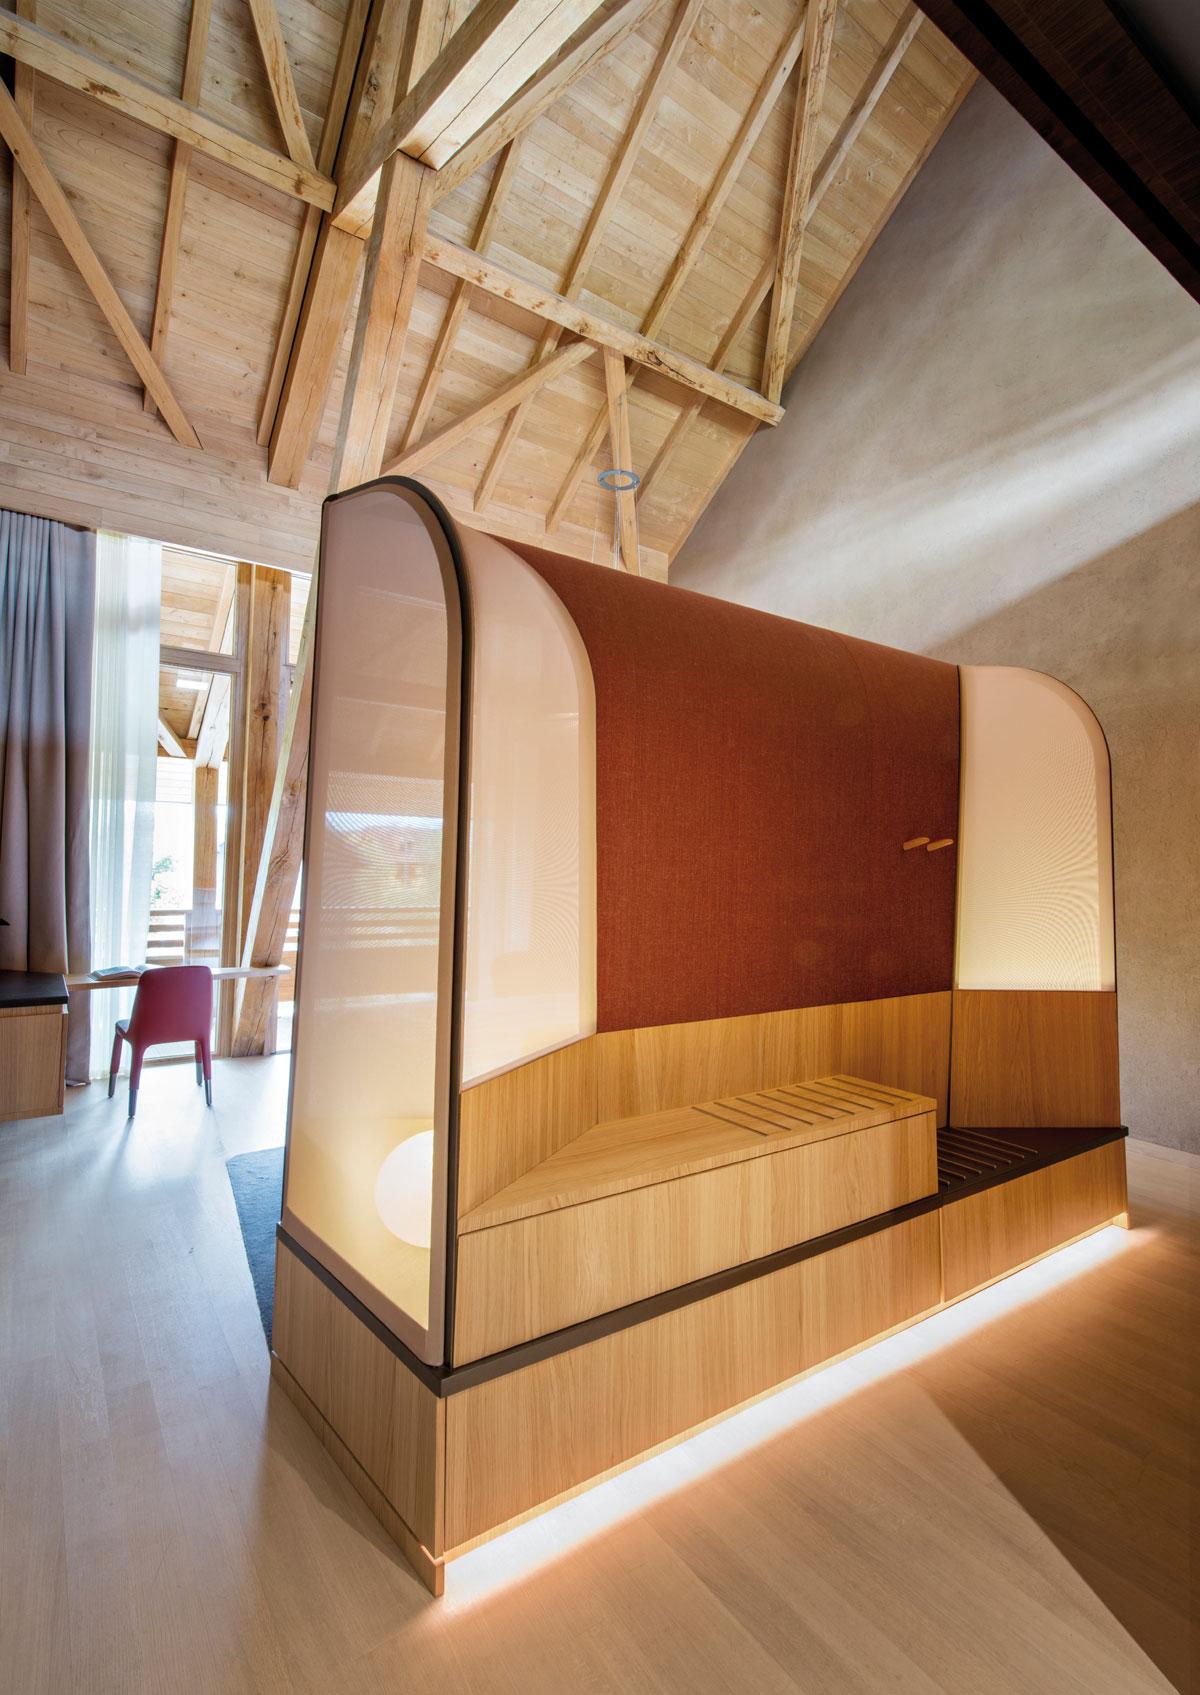 Hôtel des Berges & Spa des Saules, architettura e interior design by Jouin Manku studio © Nicolas Mathéus